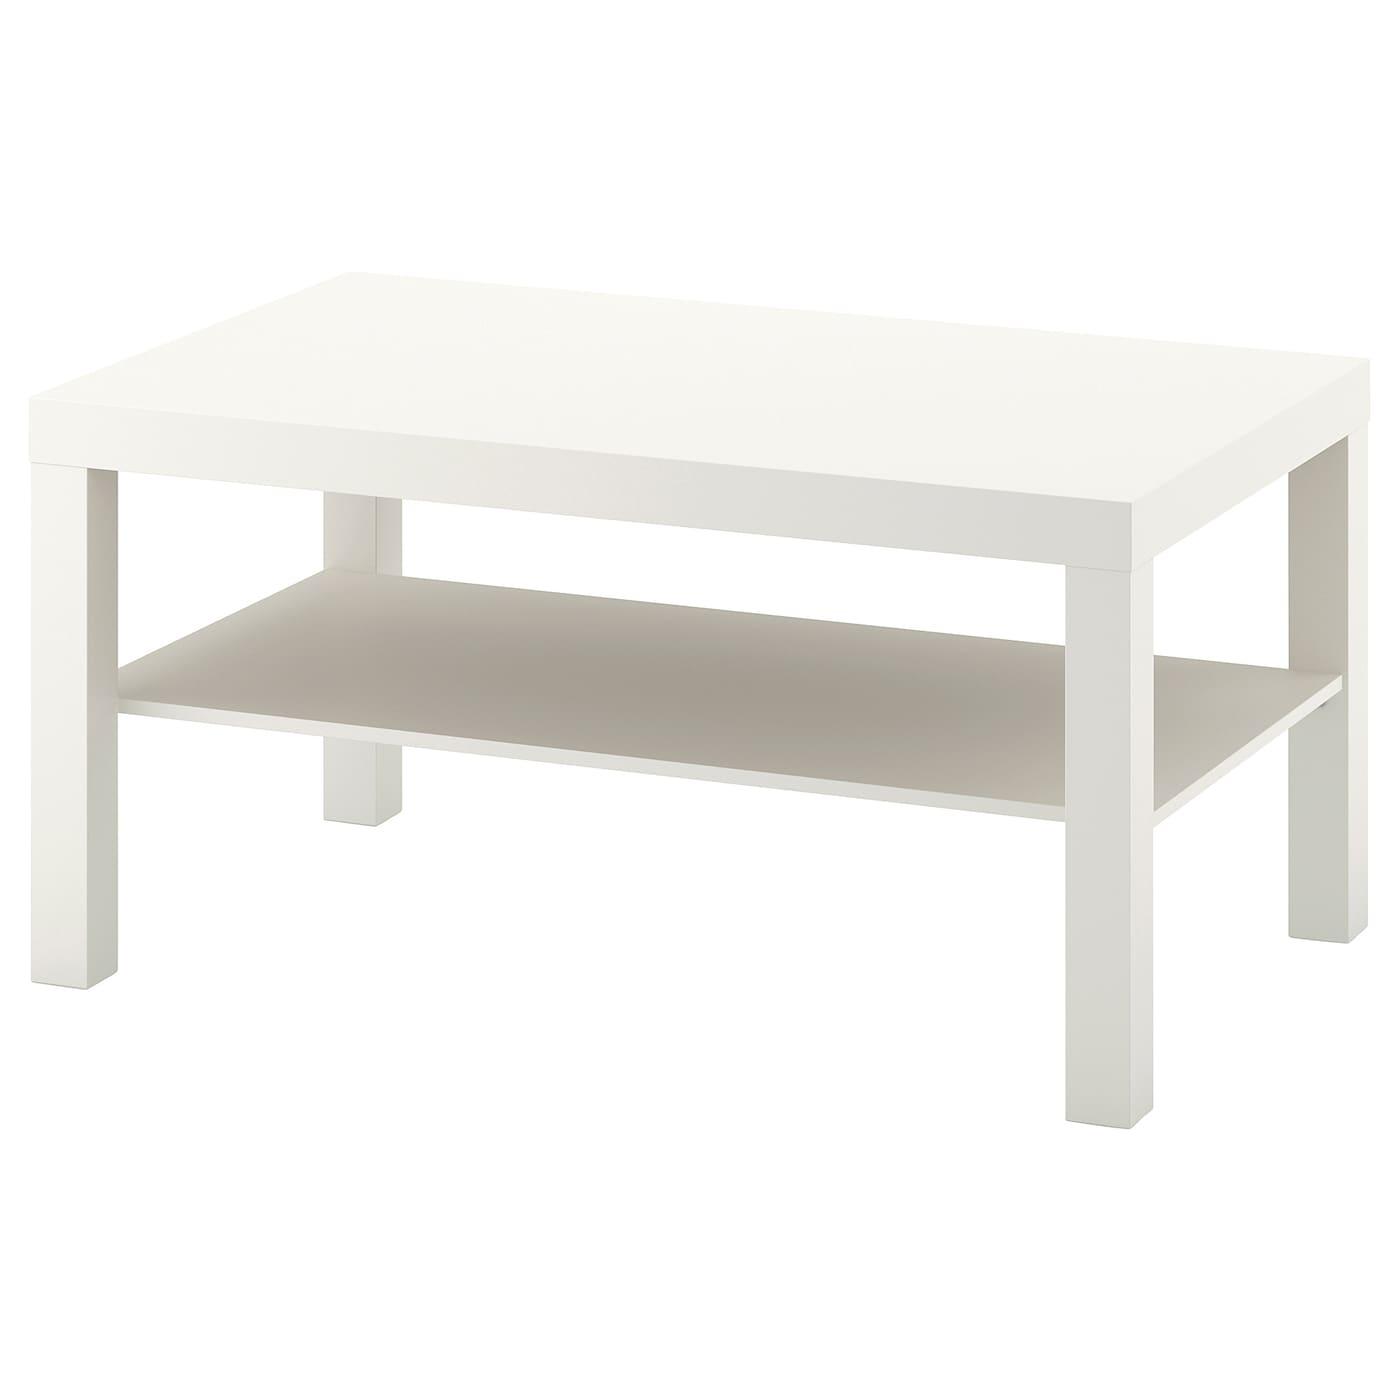 LACK Table basse, blanc, 90x55 cm IKEA